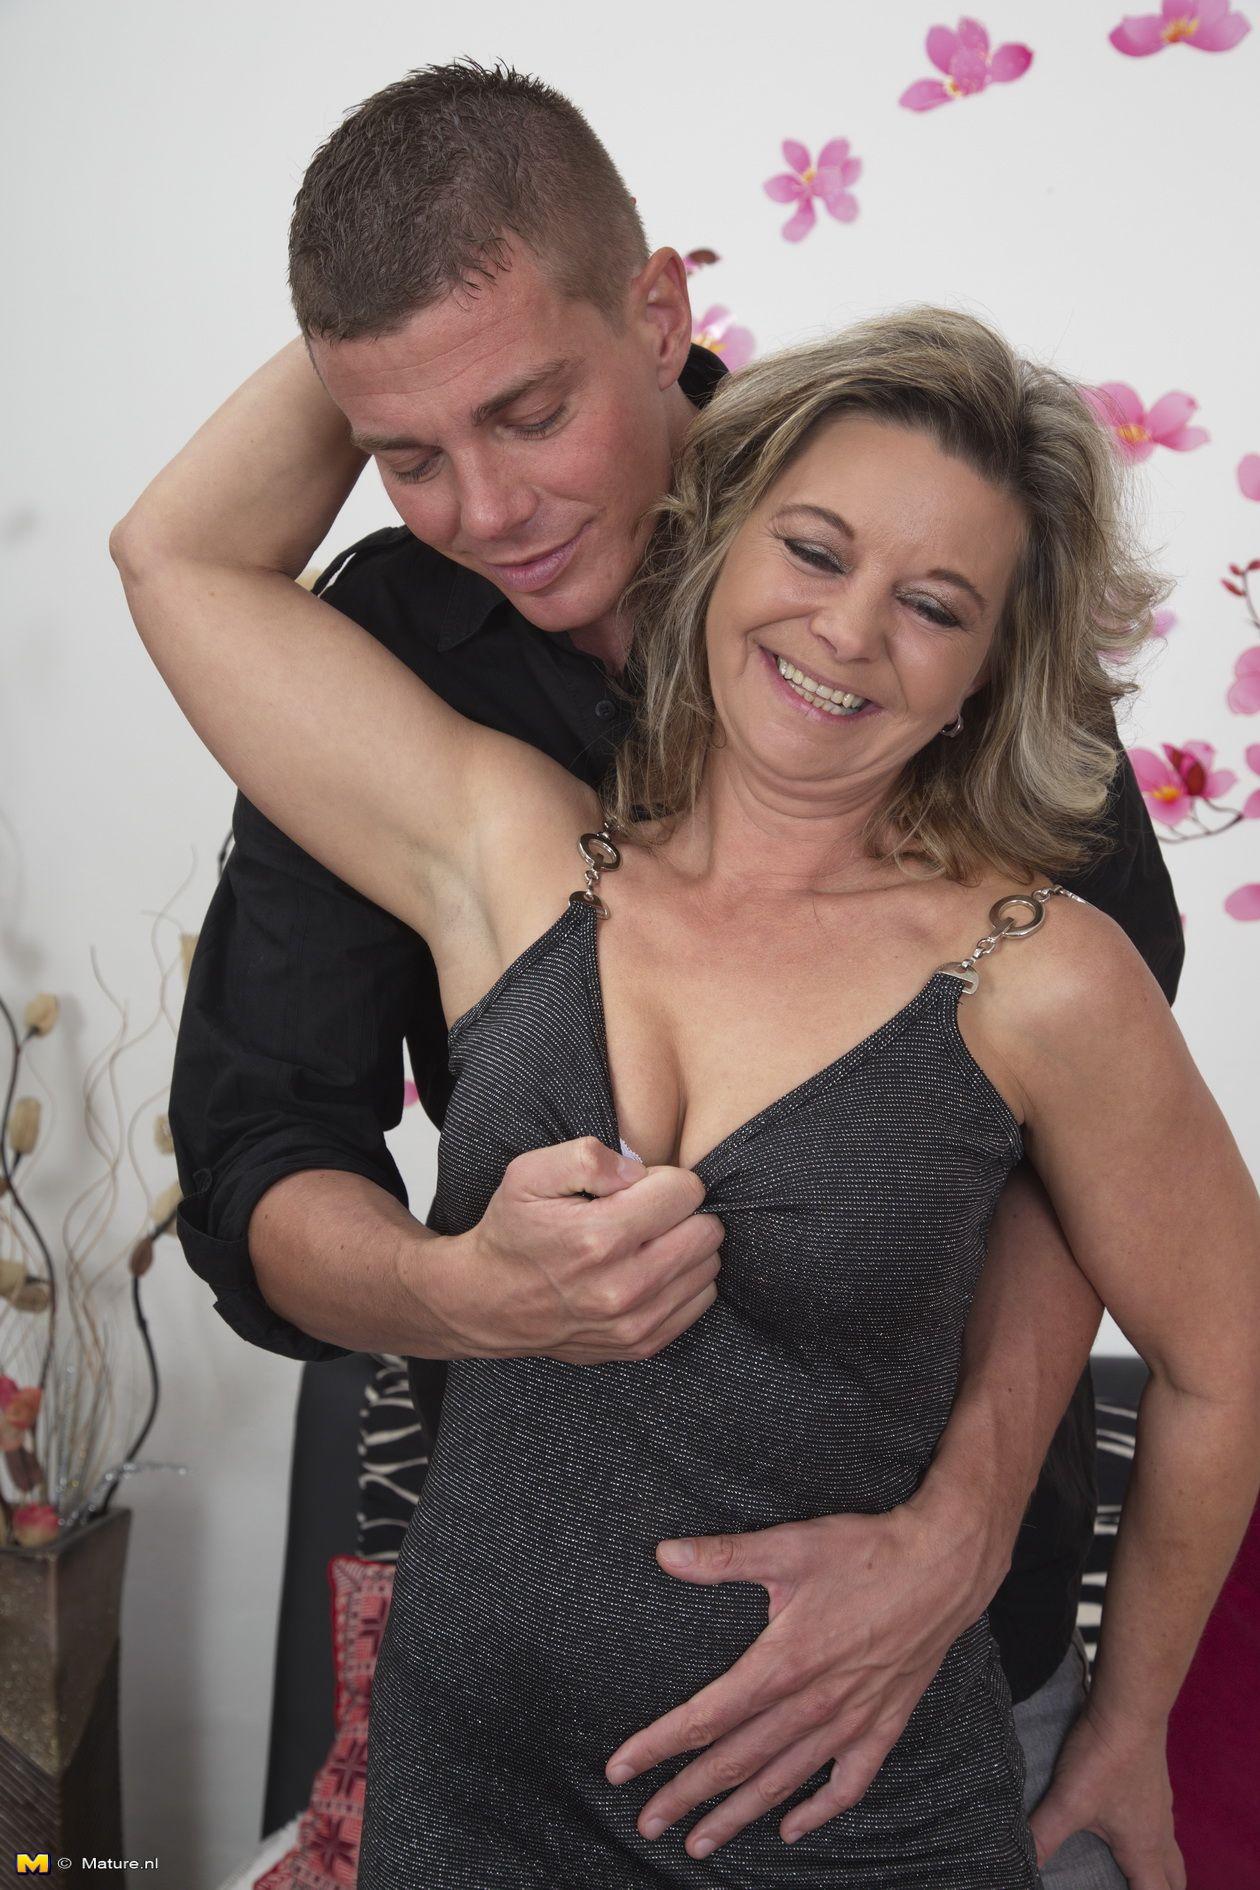 3 Matures And Boy Porn free amateur couger and boy porn . sex archive. comments: 3